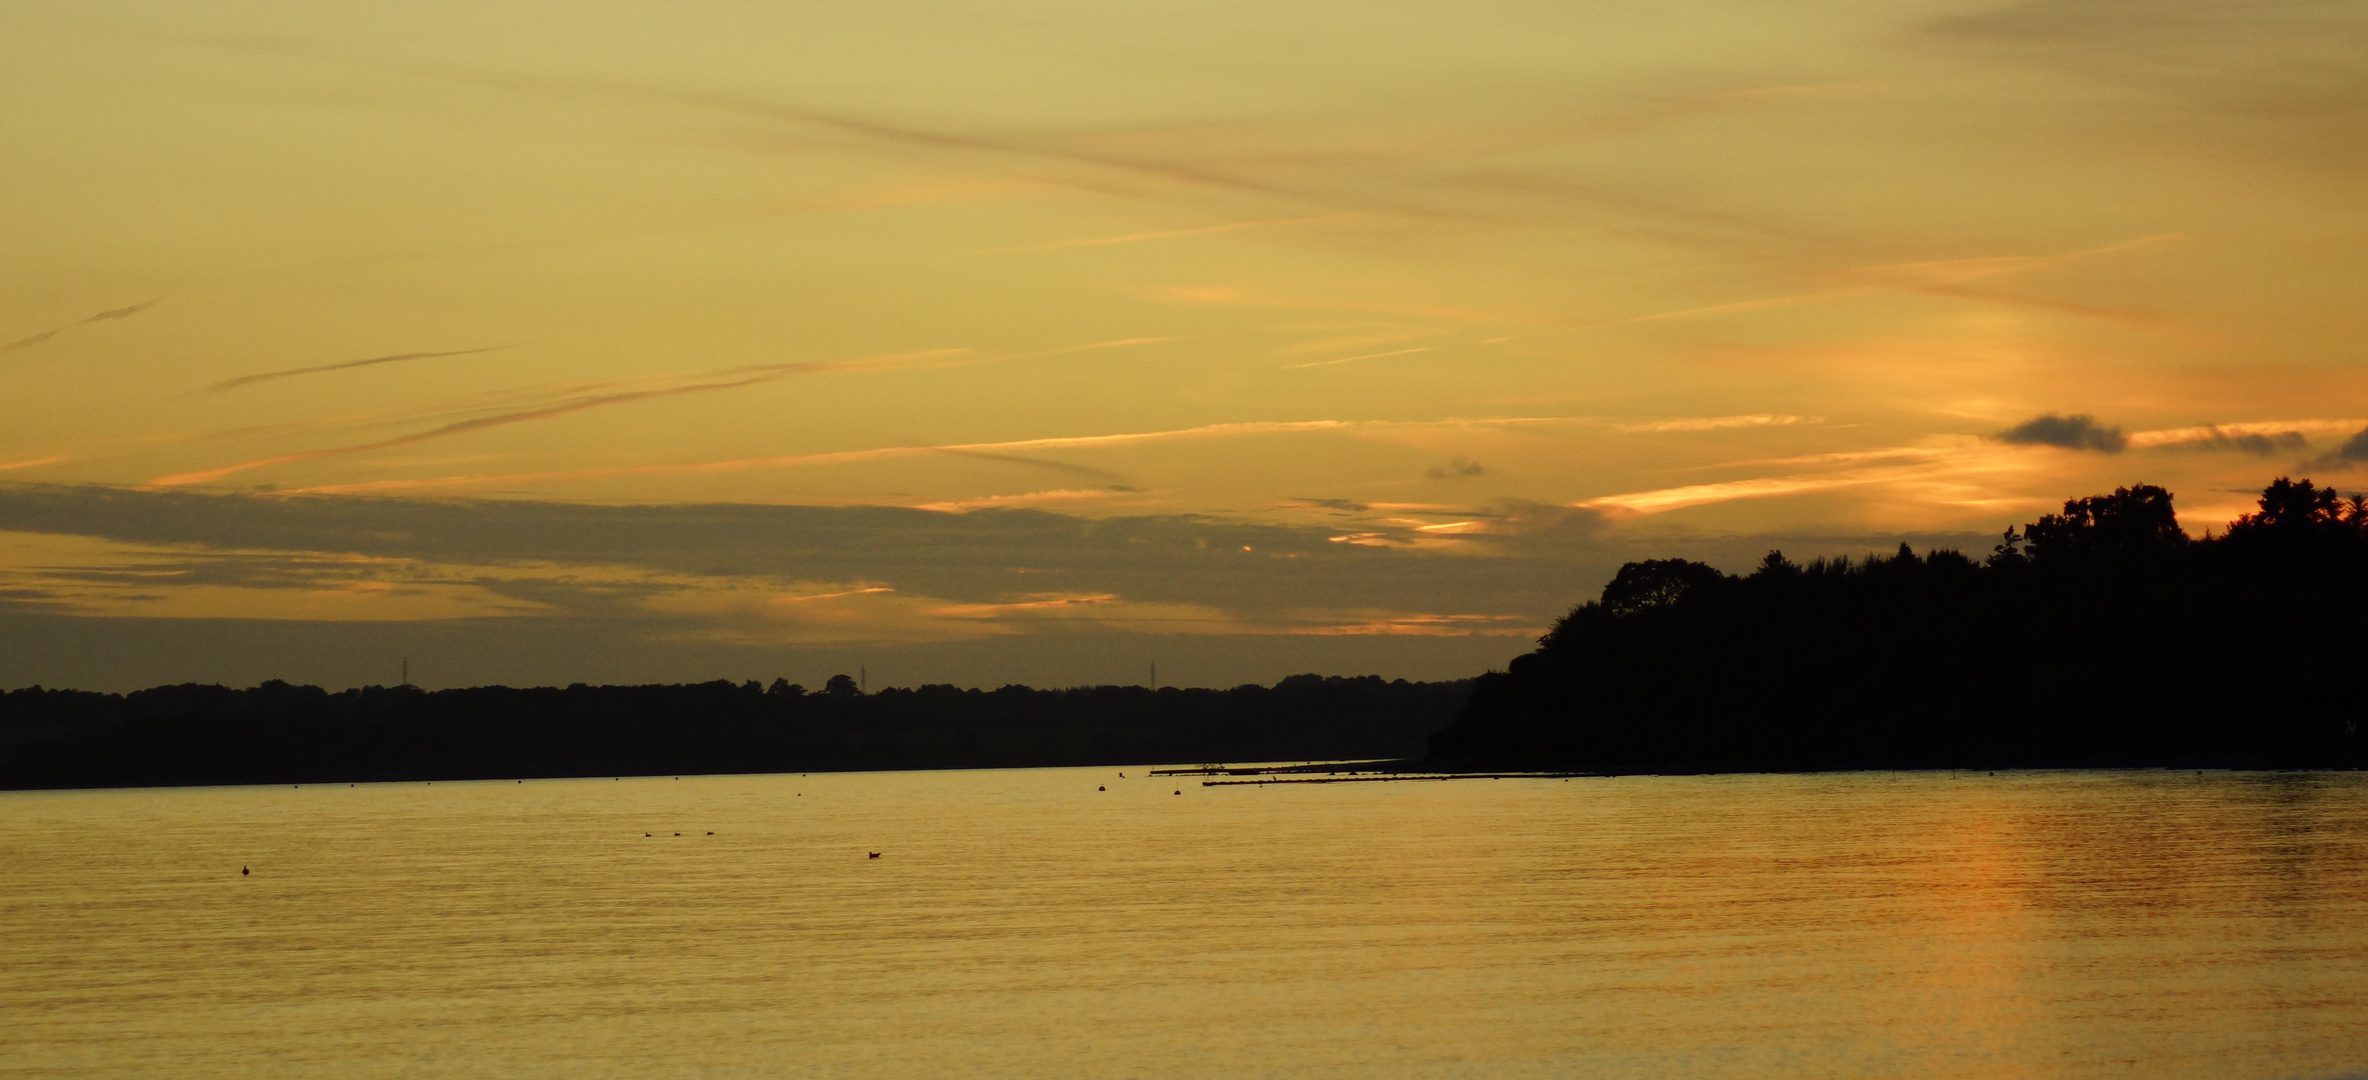 Sonnenuntergang in Pelzerhaken